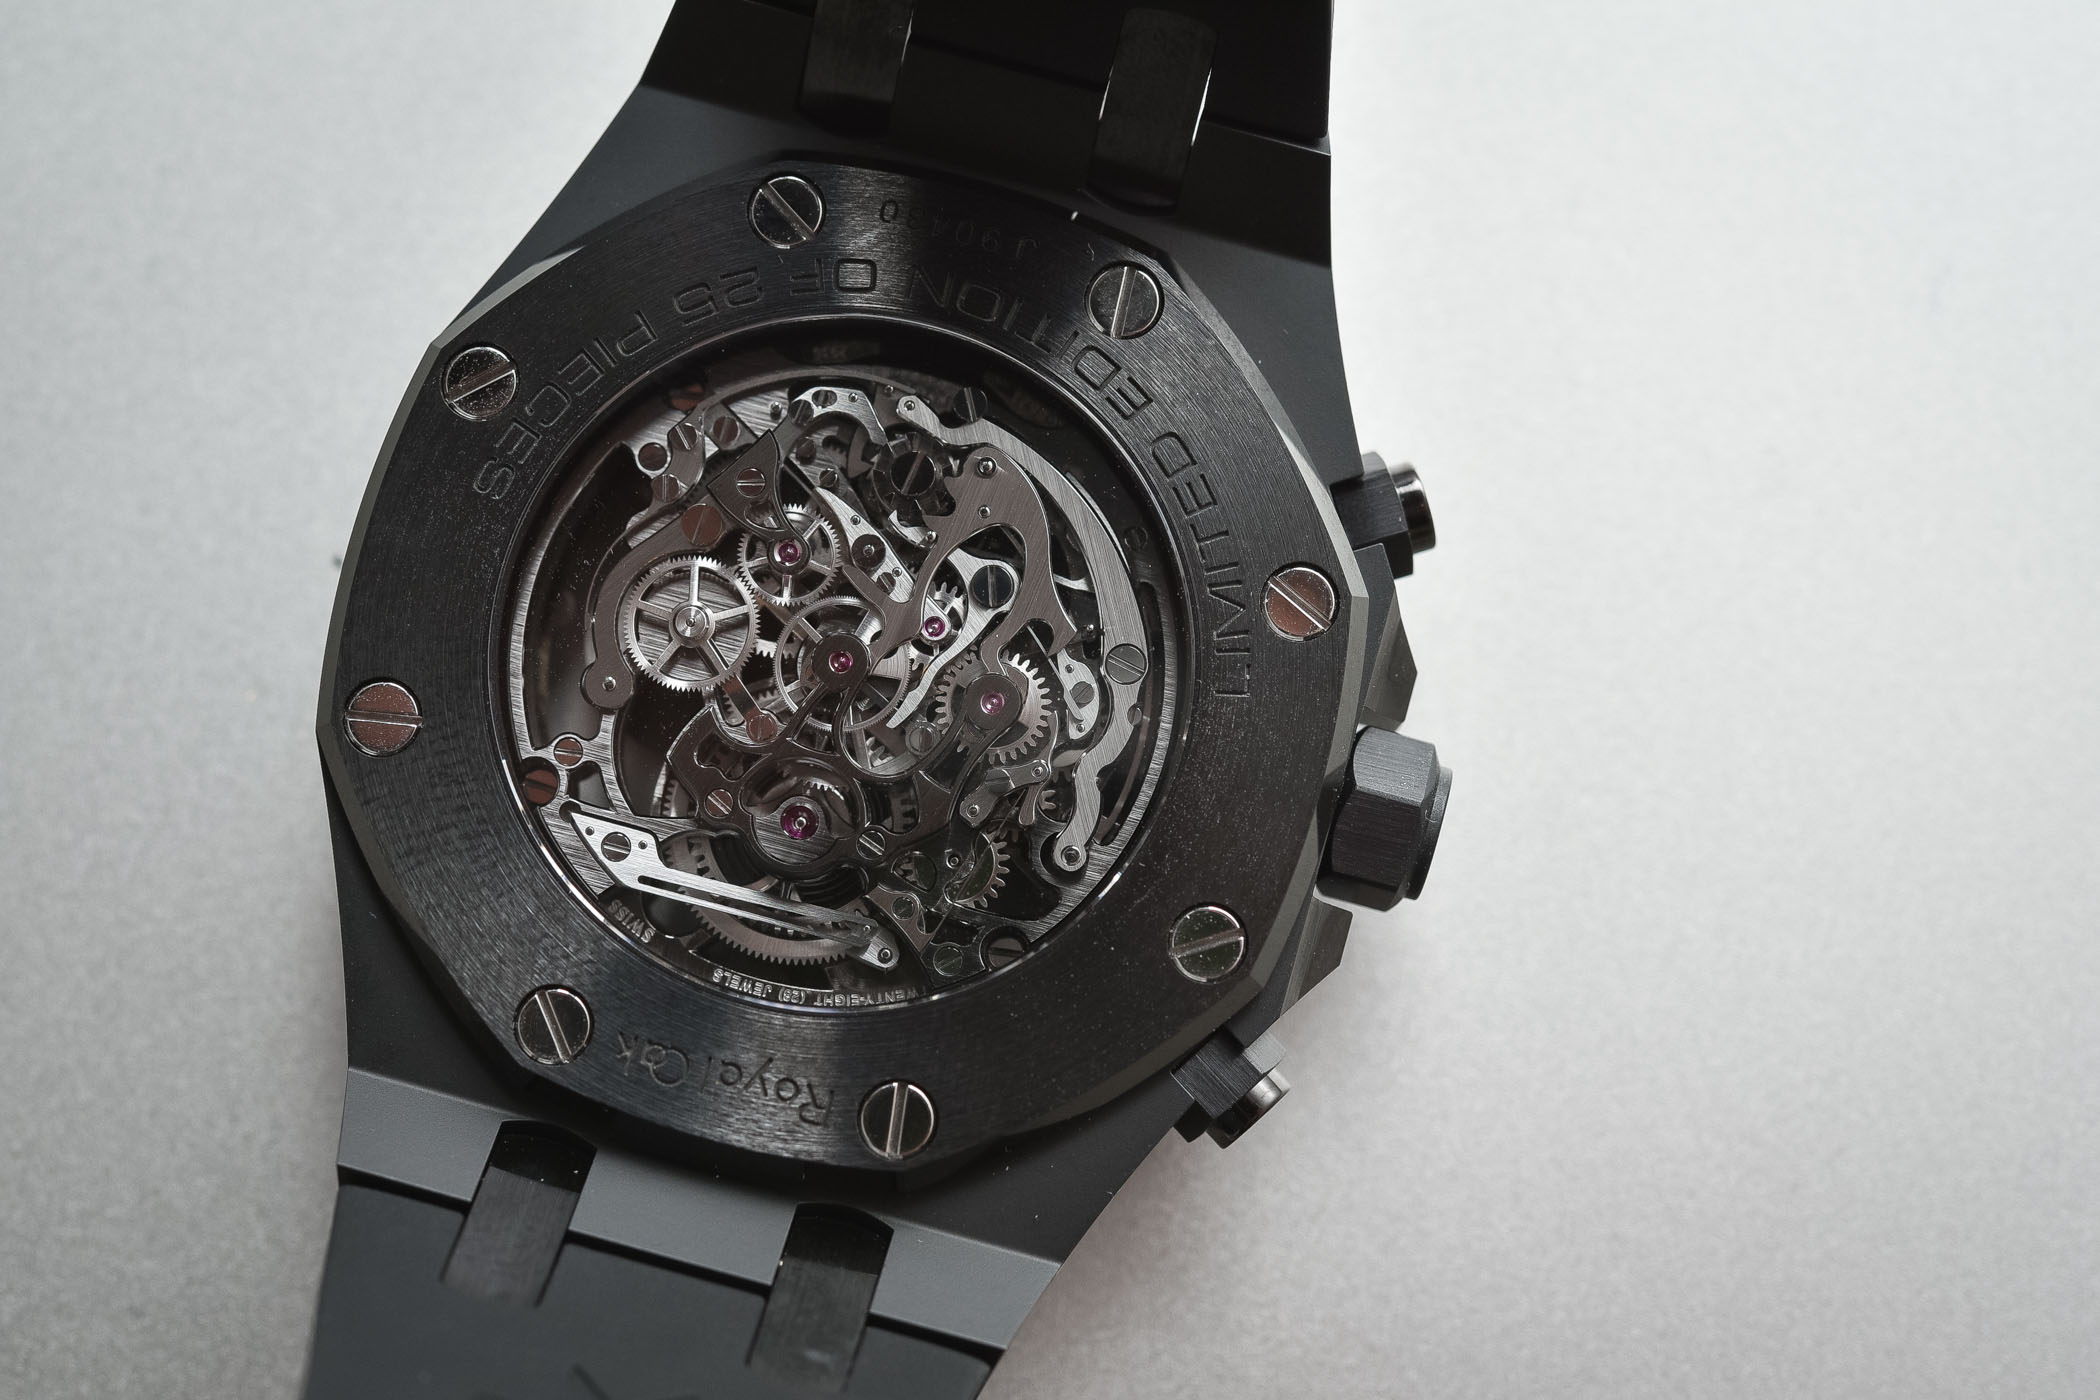 Audemars Piguet Royal Oak Tourbillon Chronograph Openworked Black Ceramic ref. 26343CE